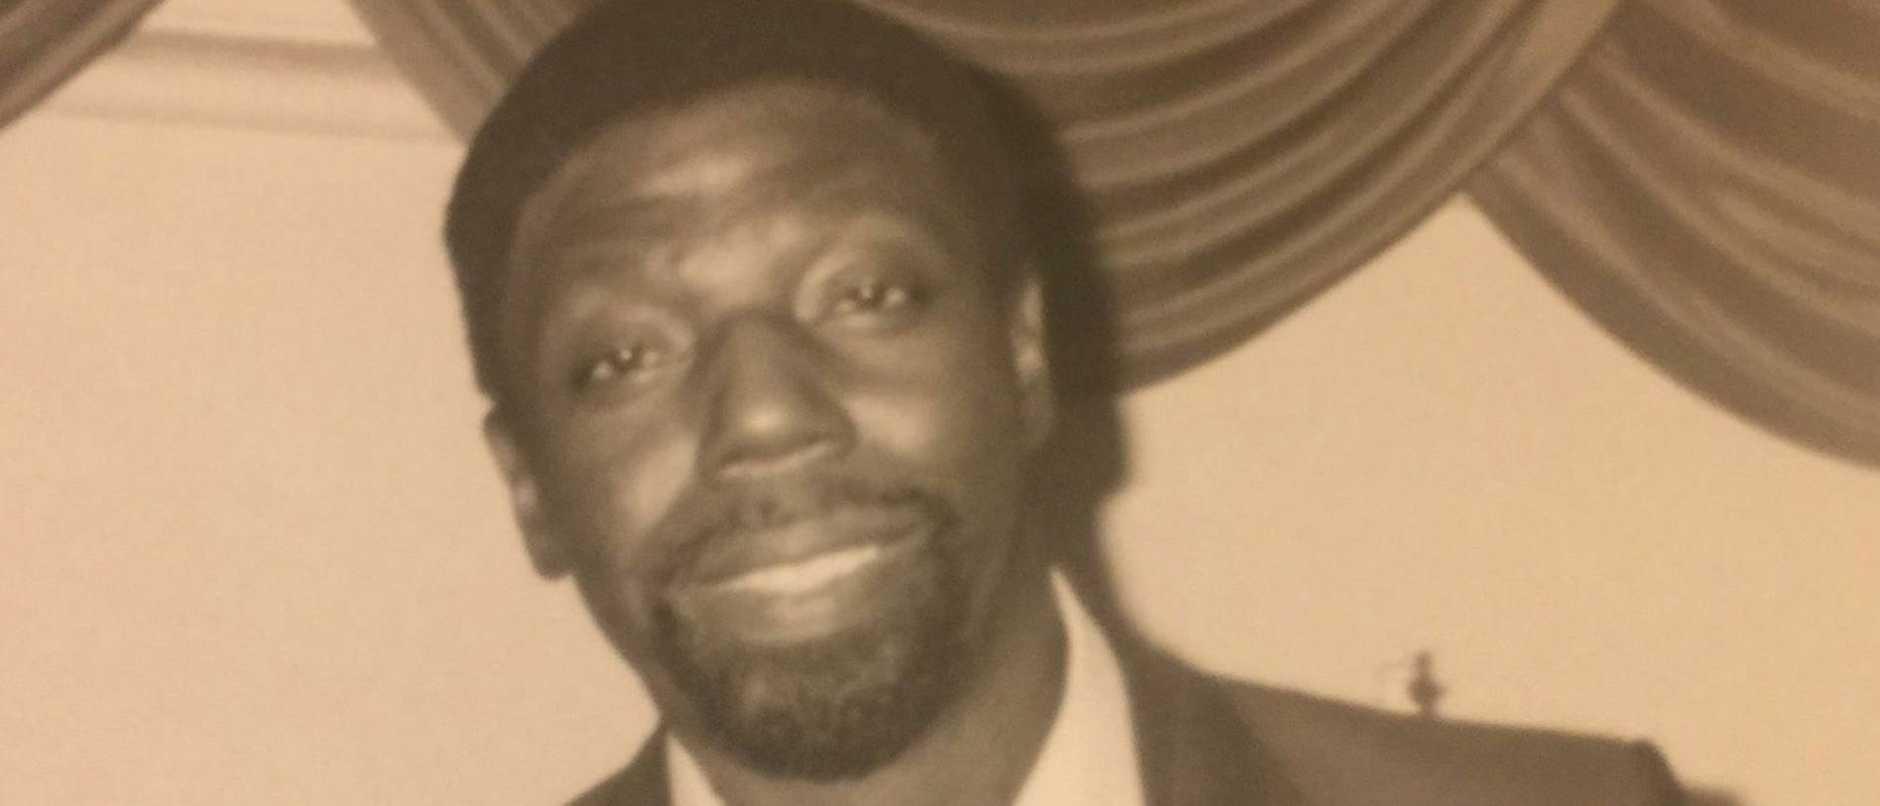 Man taken off life support in horrible case of mistaken identity